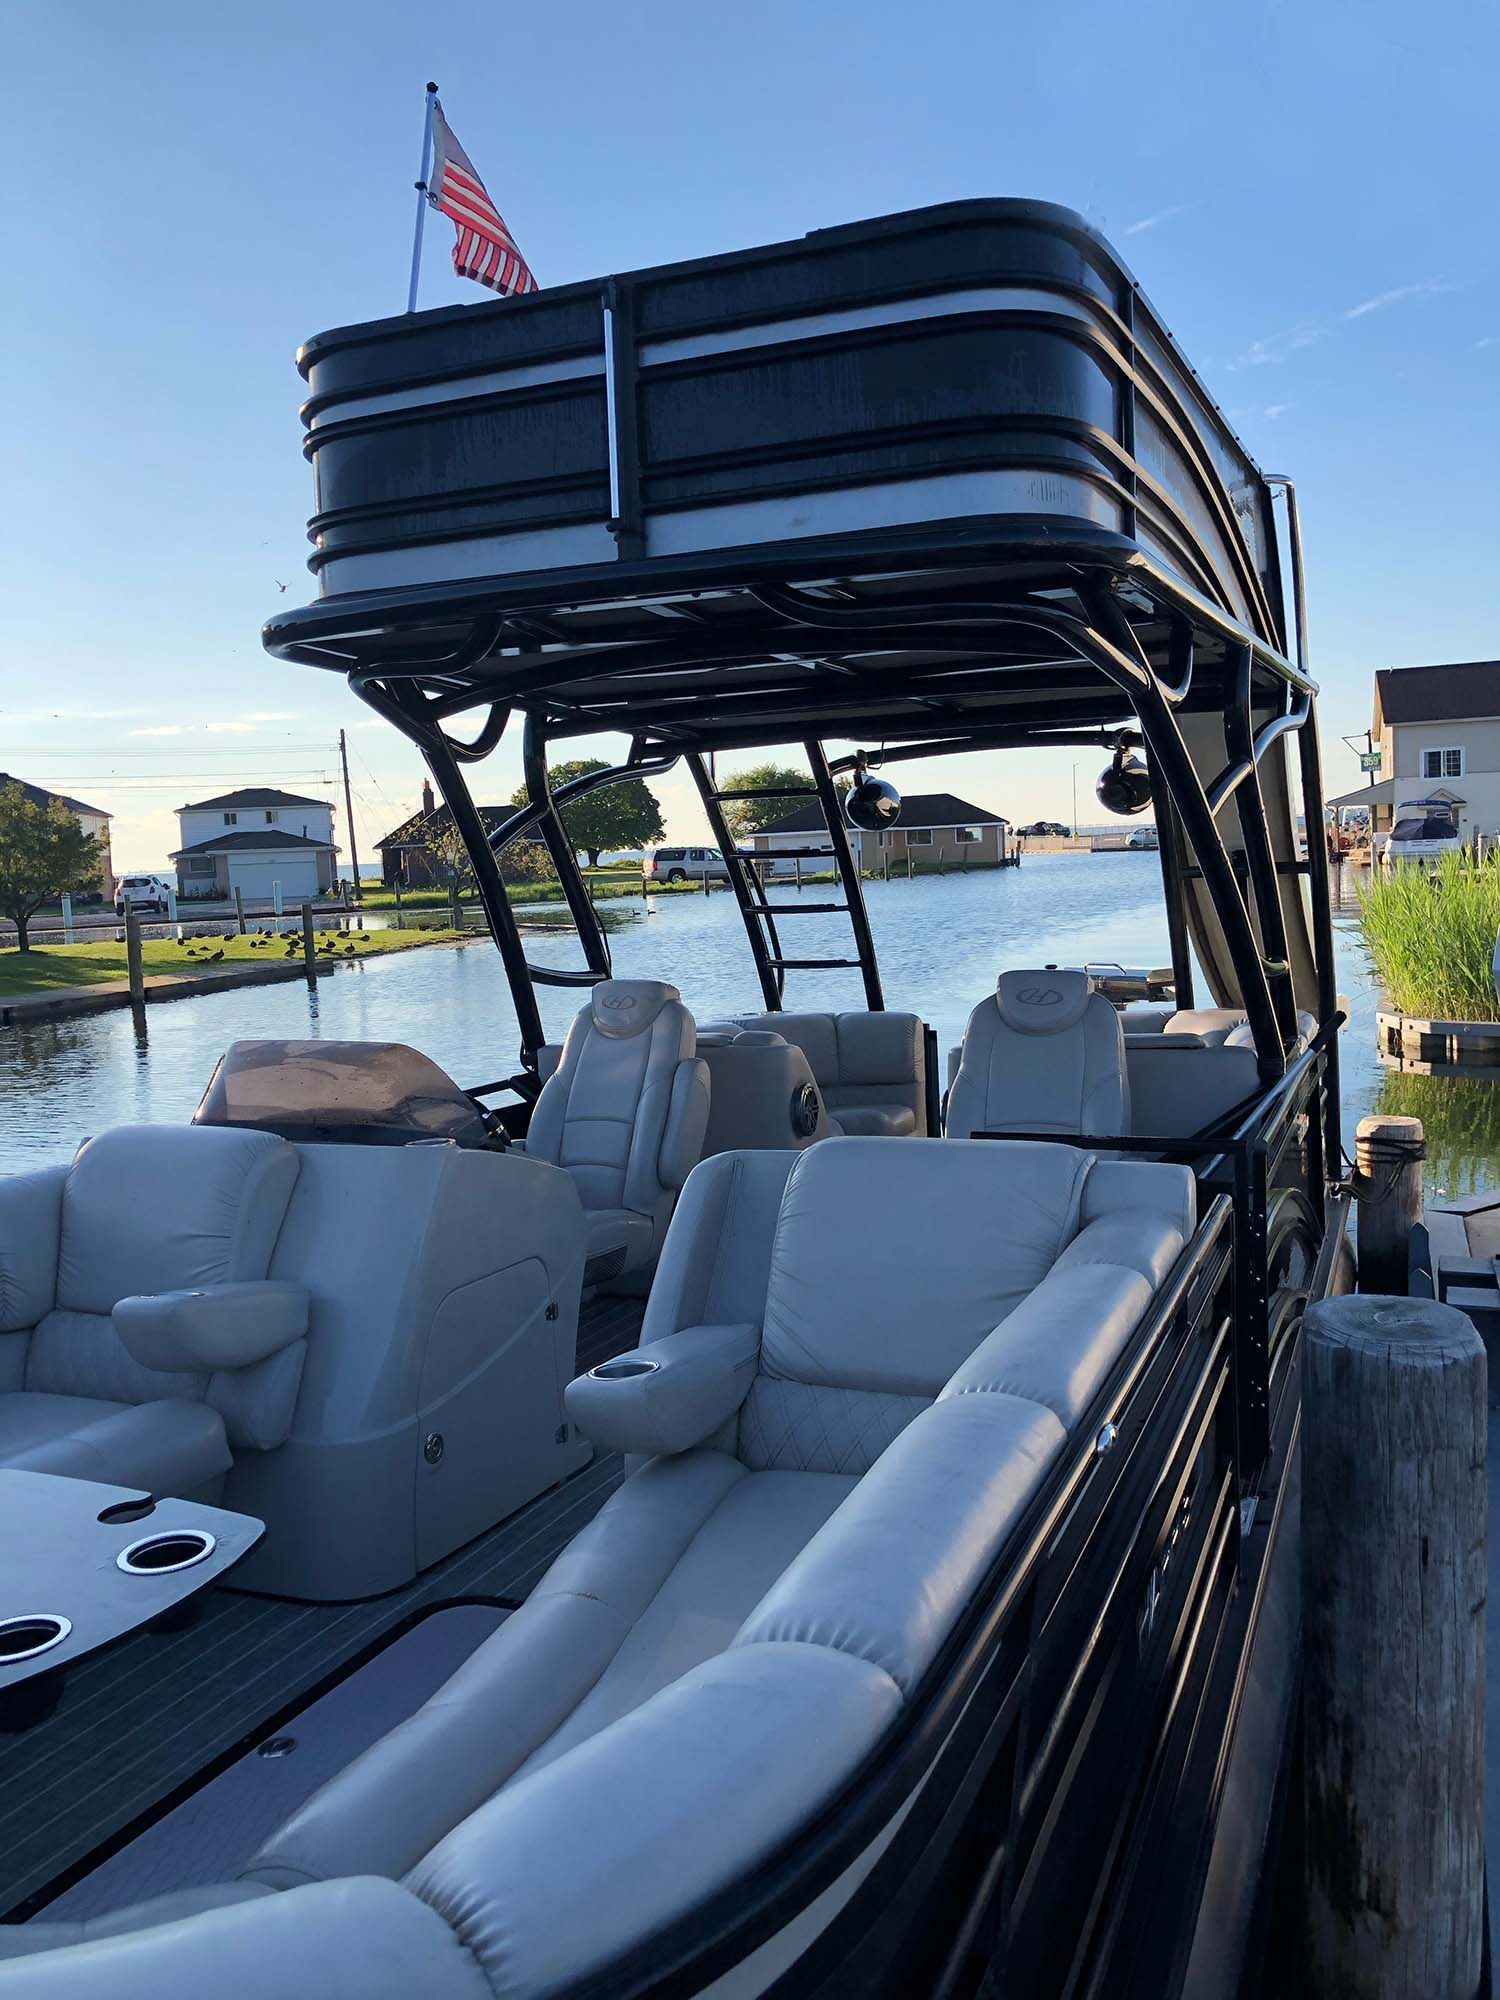 Lone Star Party Boats - Black Stallion double decker pontoon.